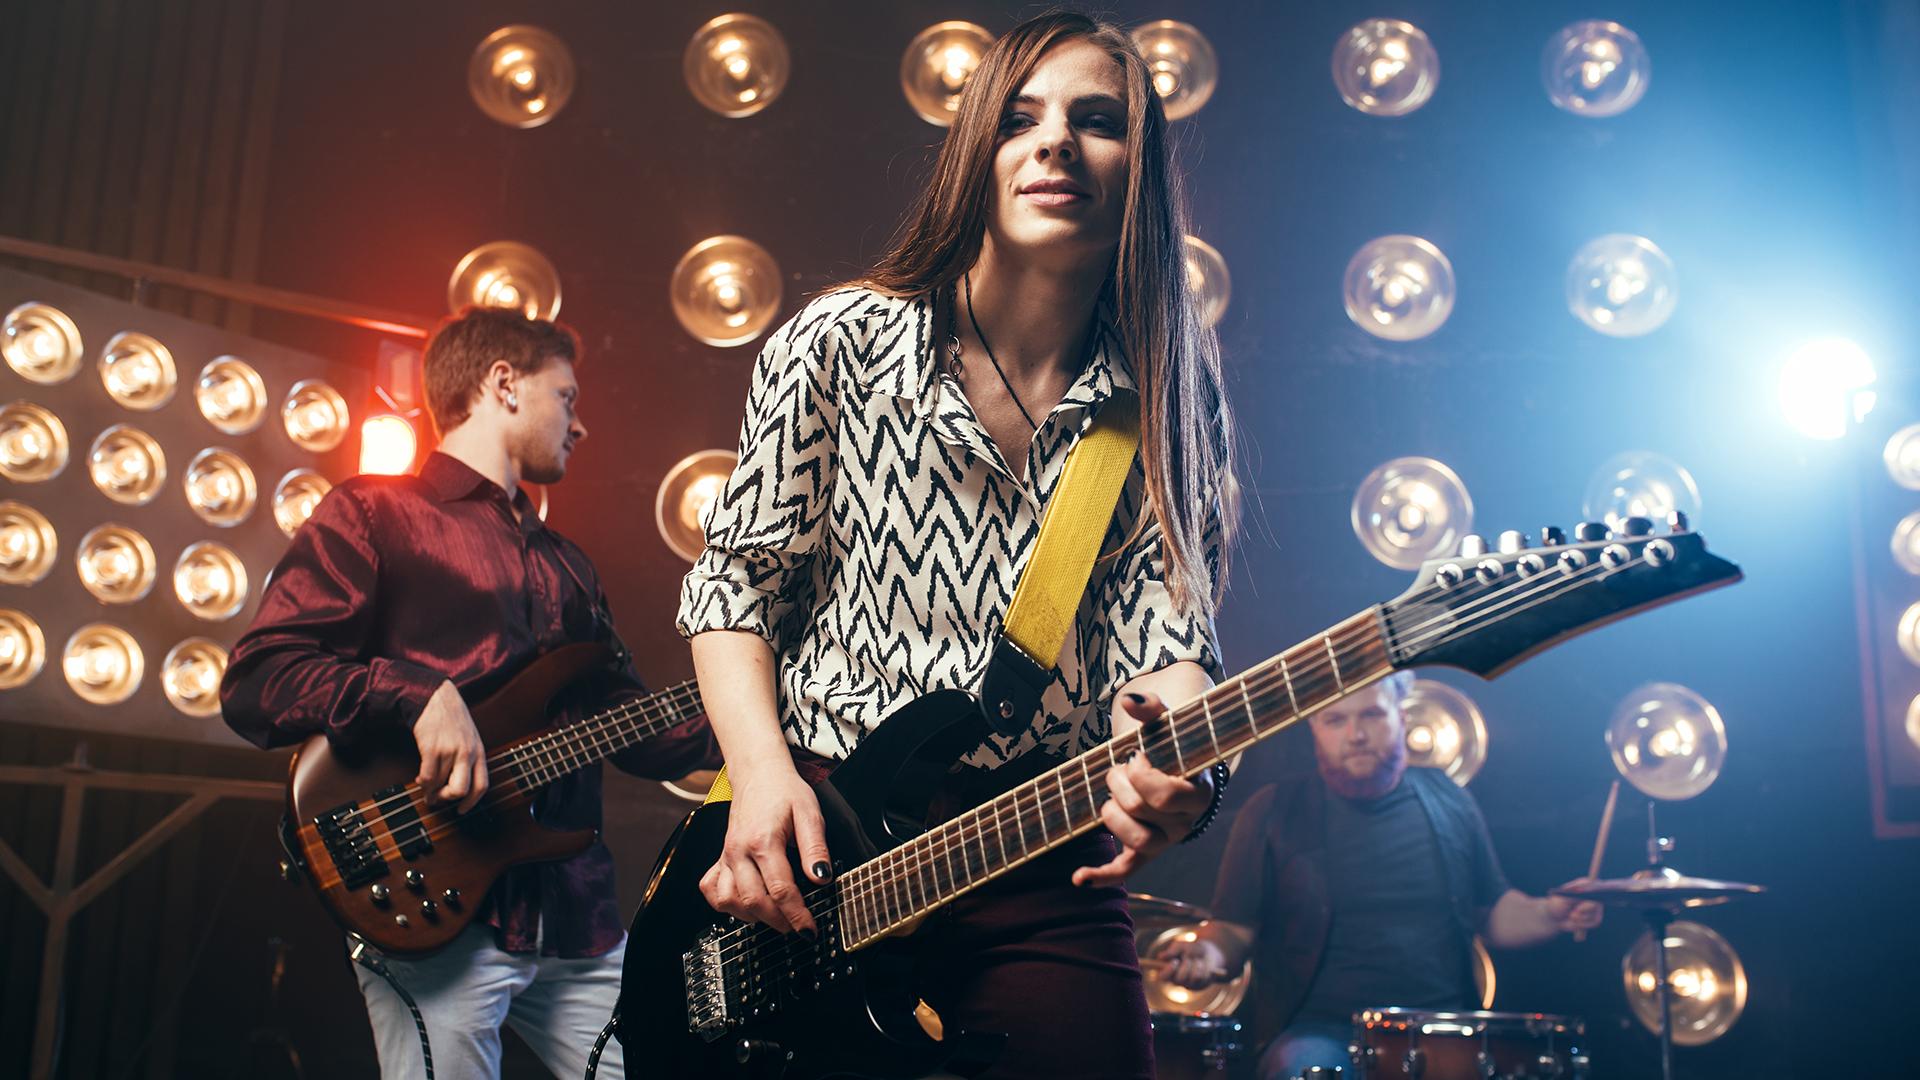 live-band-bg